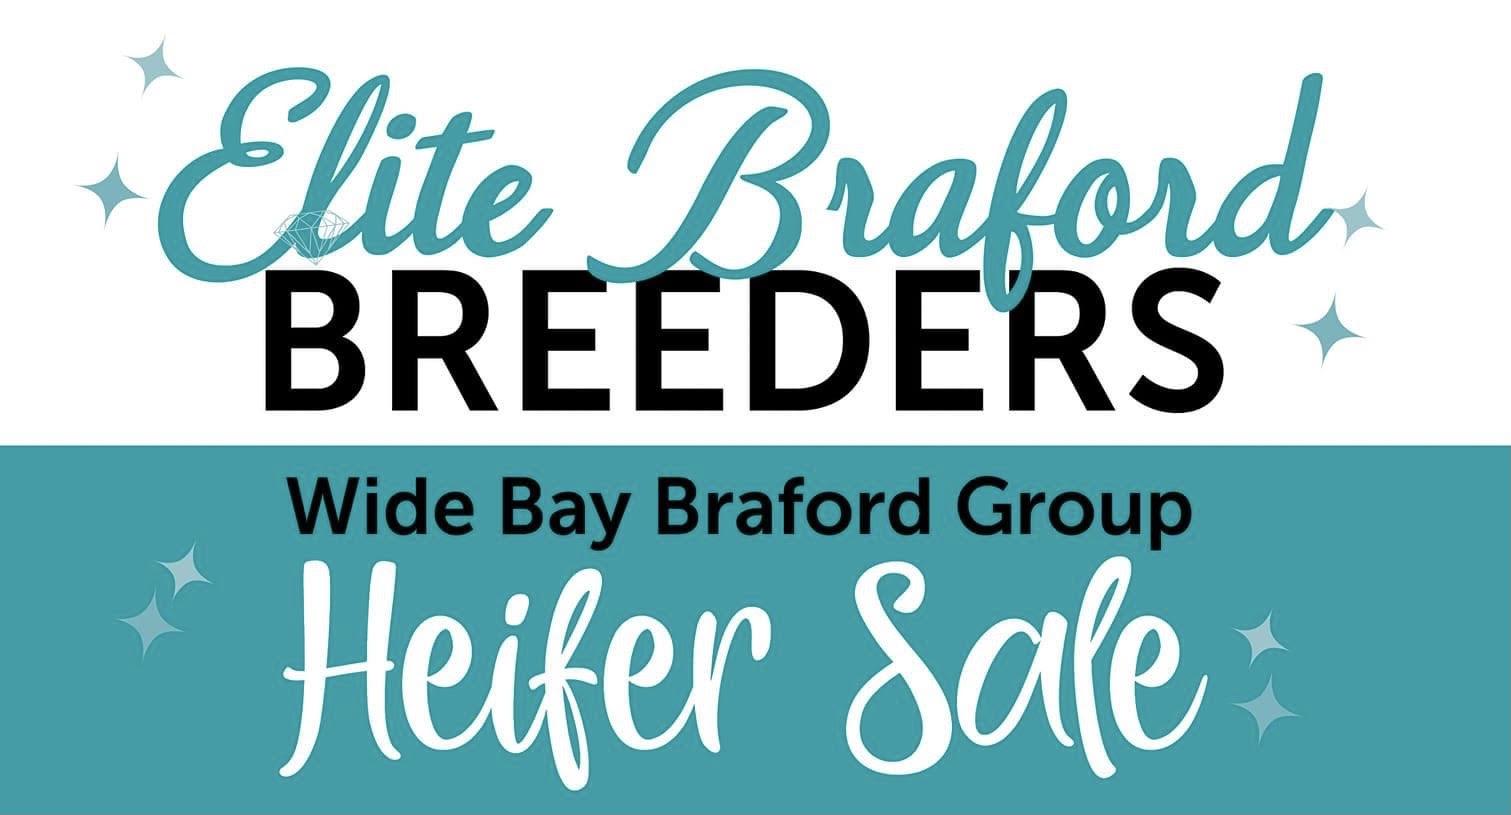 Elite Braford Breeders Heifer Sale